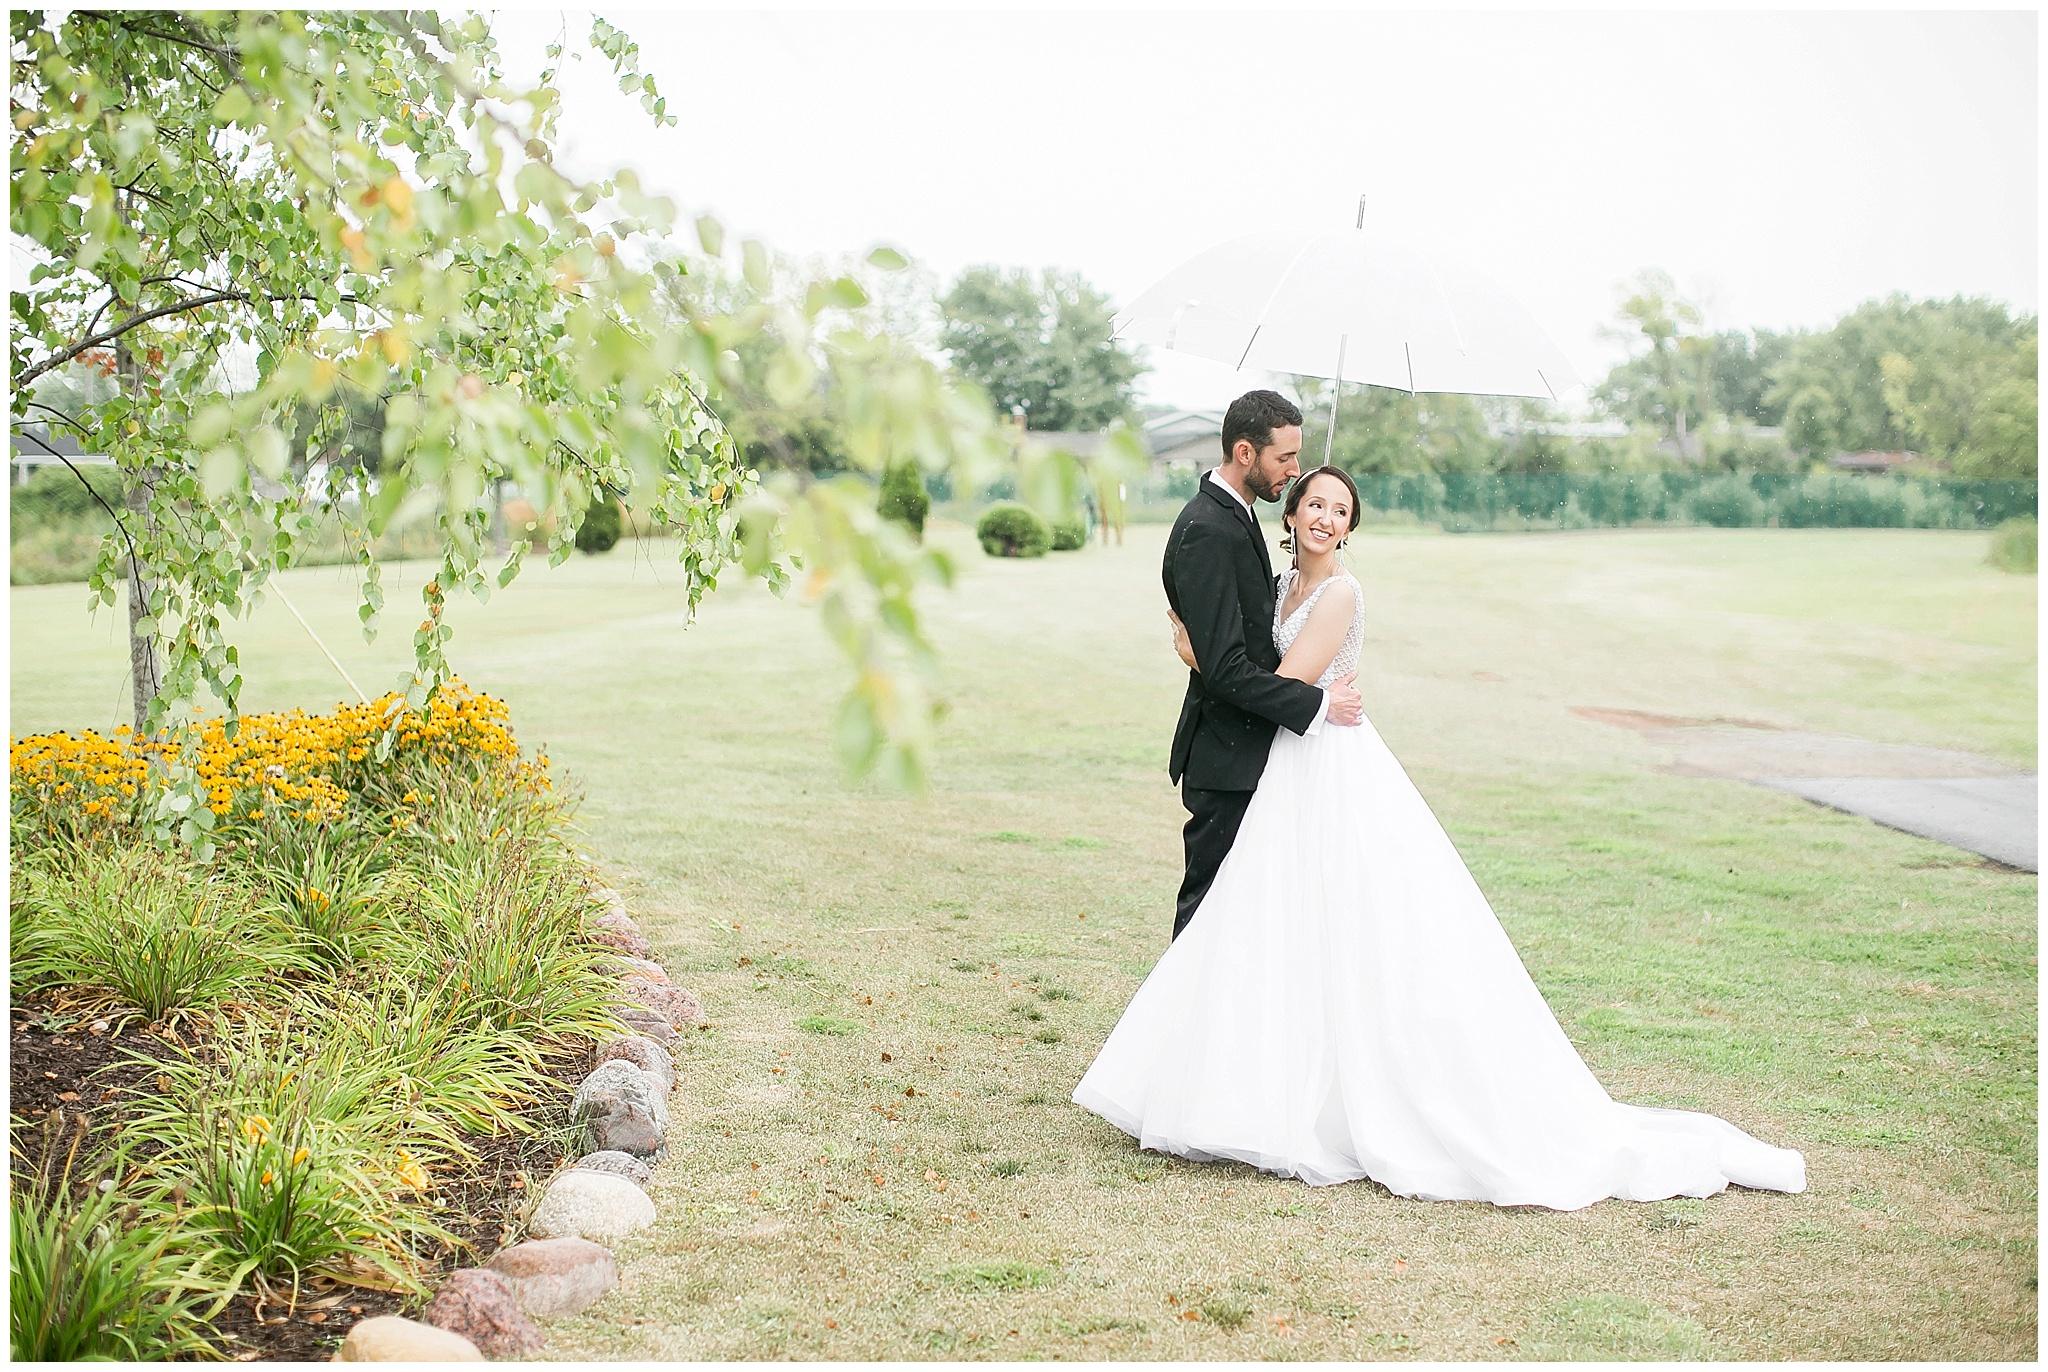 bridgewood_resort_wedding_neenah_wisconsin_0338.jpg